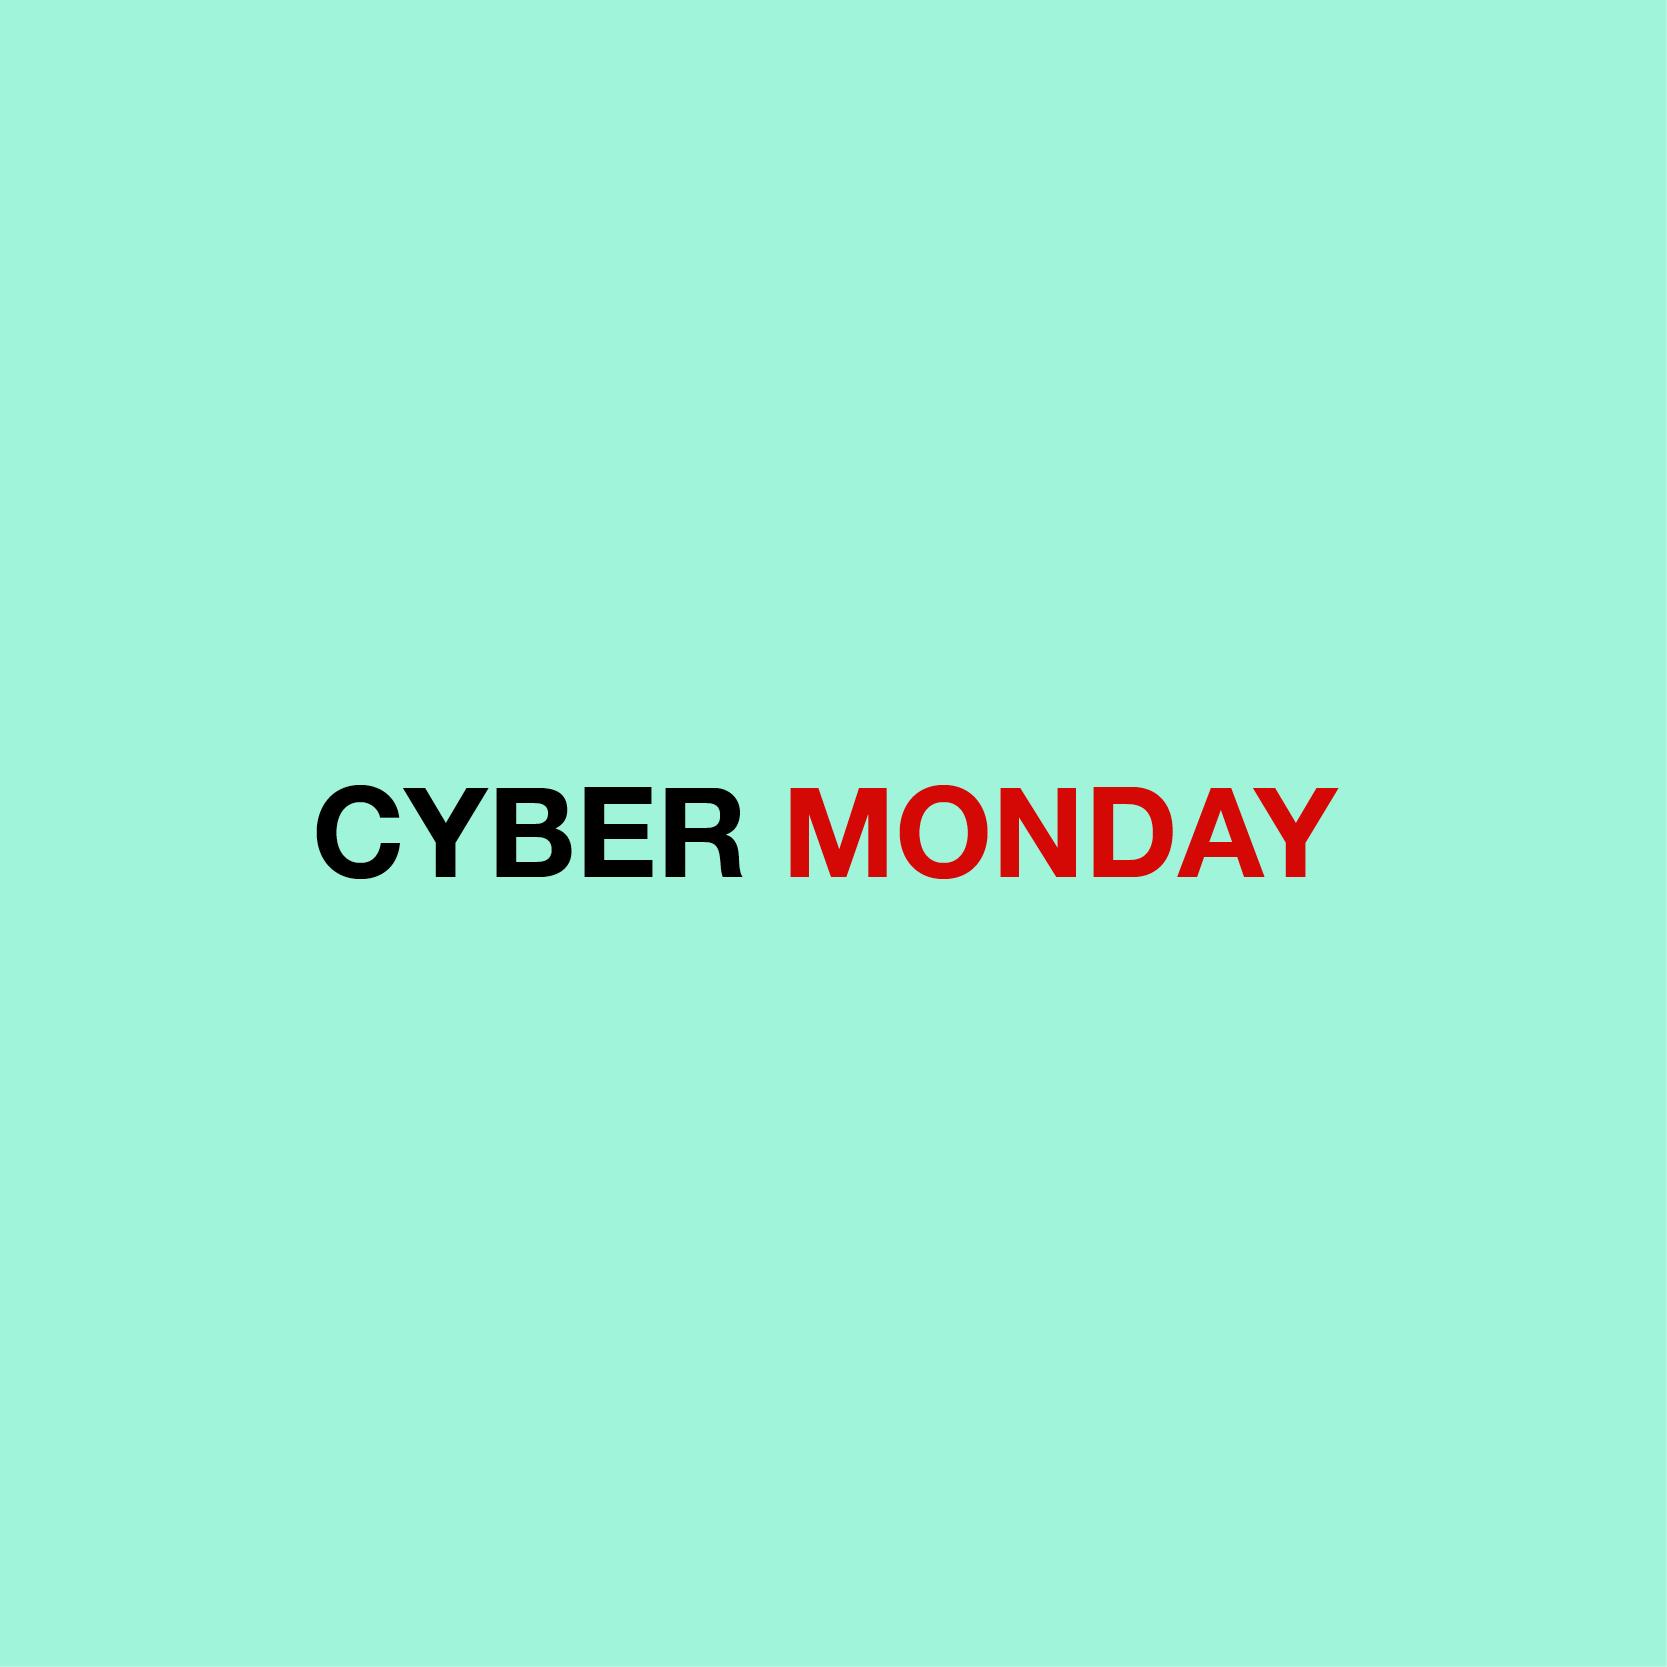 Insta_CYBER MONDAY 1.jpg